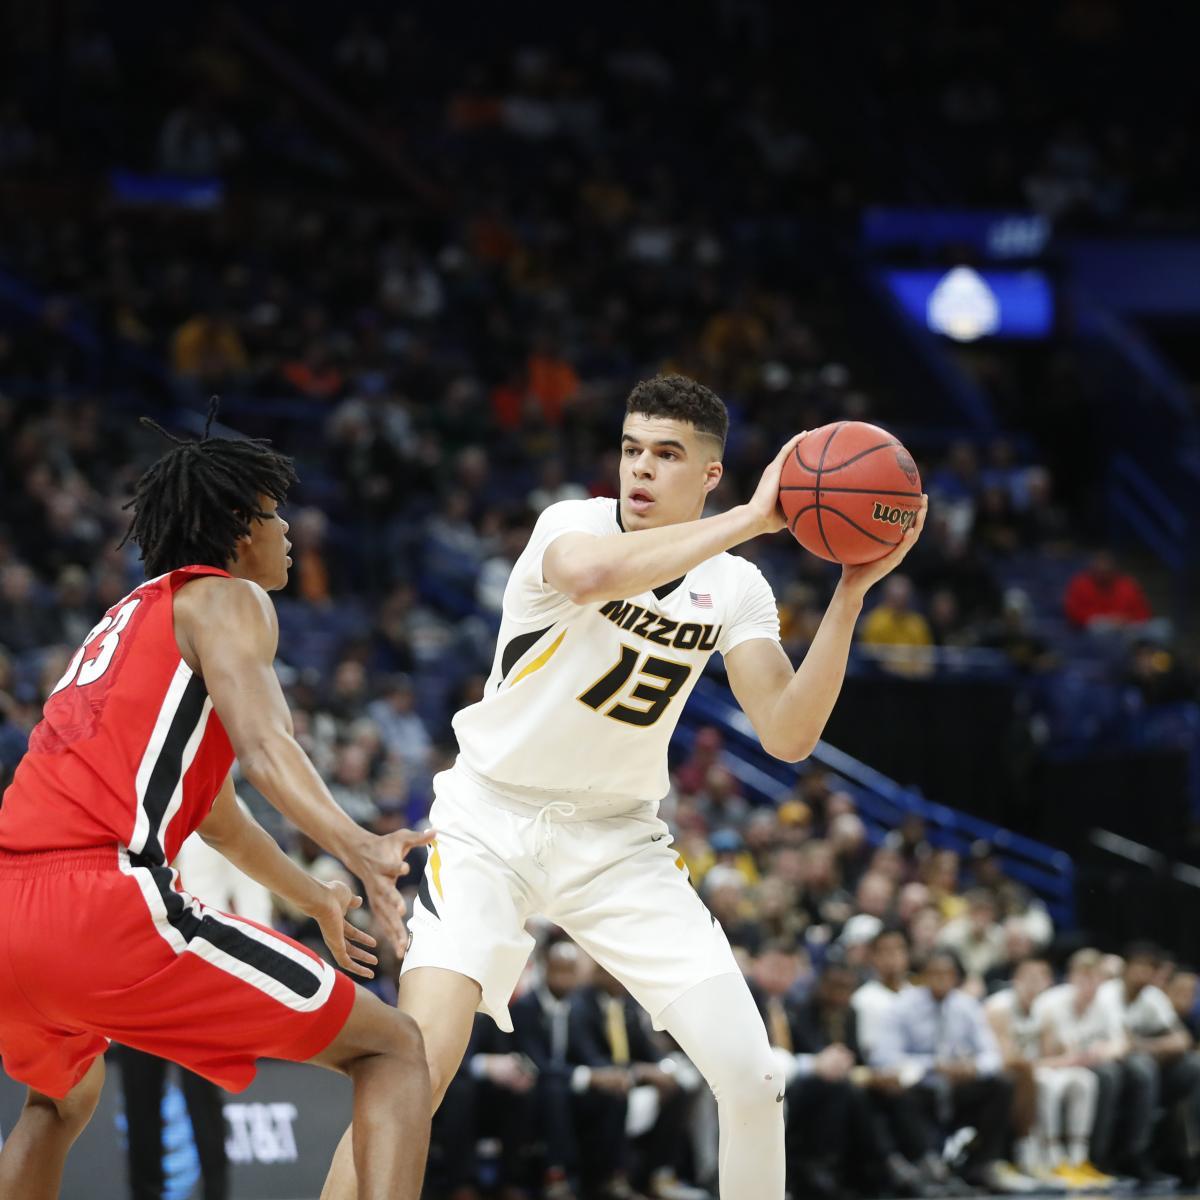 Michael Porter Jr. NBA Draft 2018: Scouting Report For